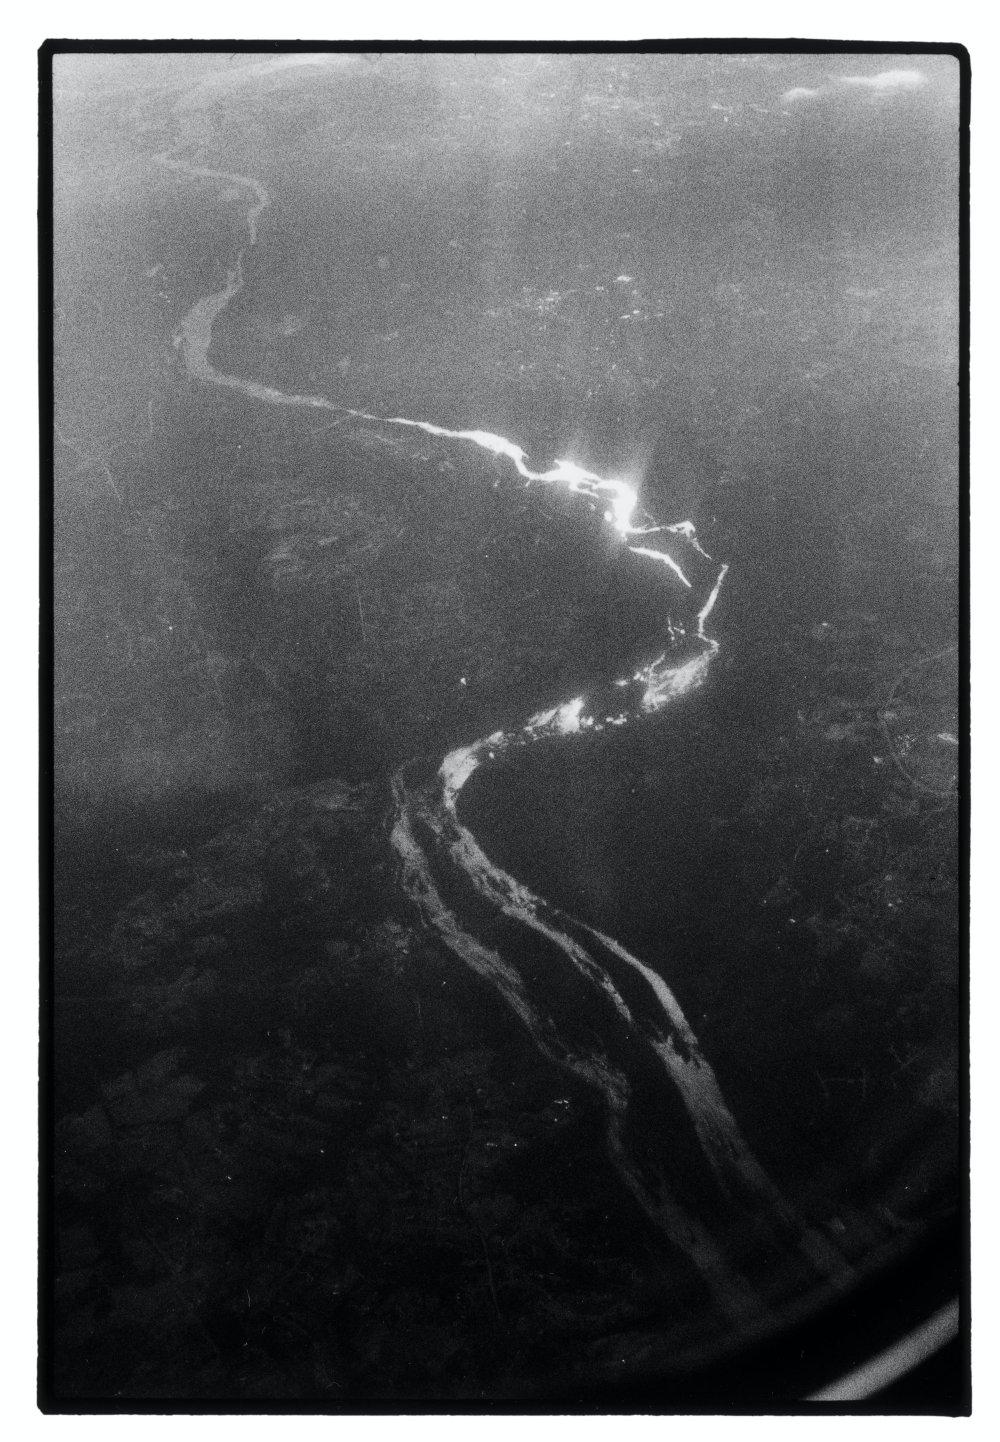 Untitled Aerial